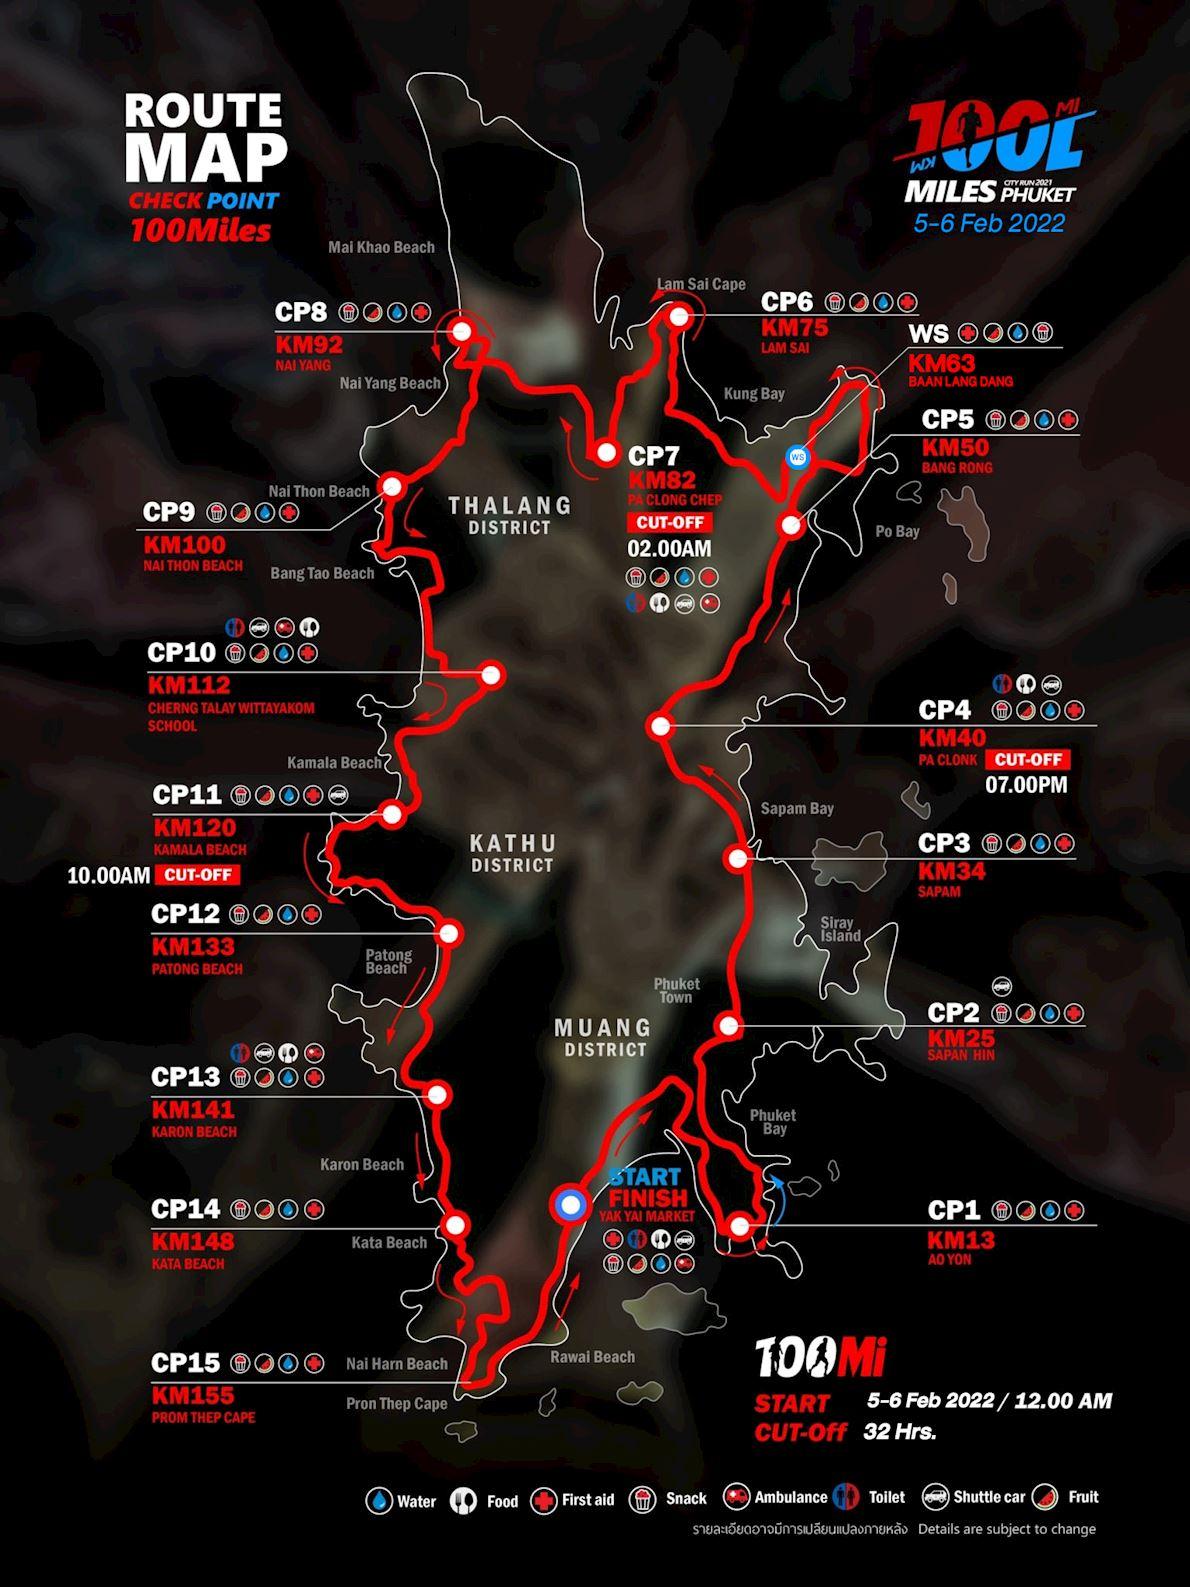 100Miles Phuket Route Map